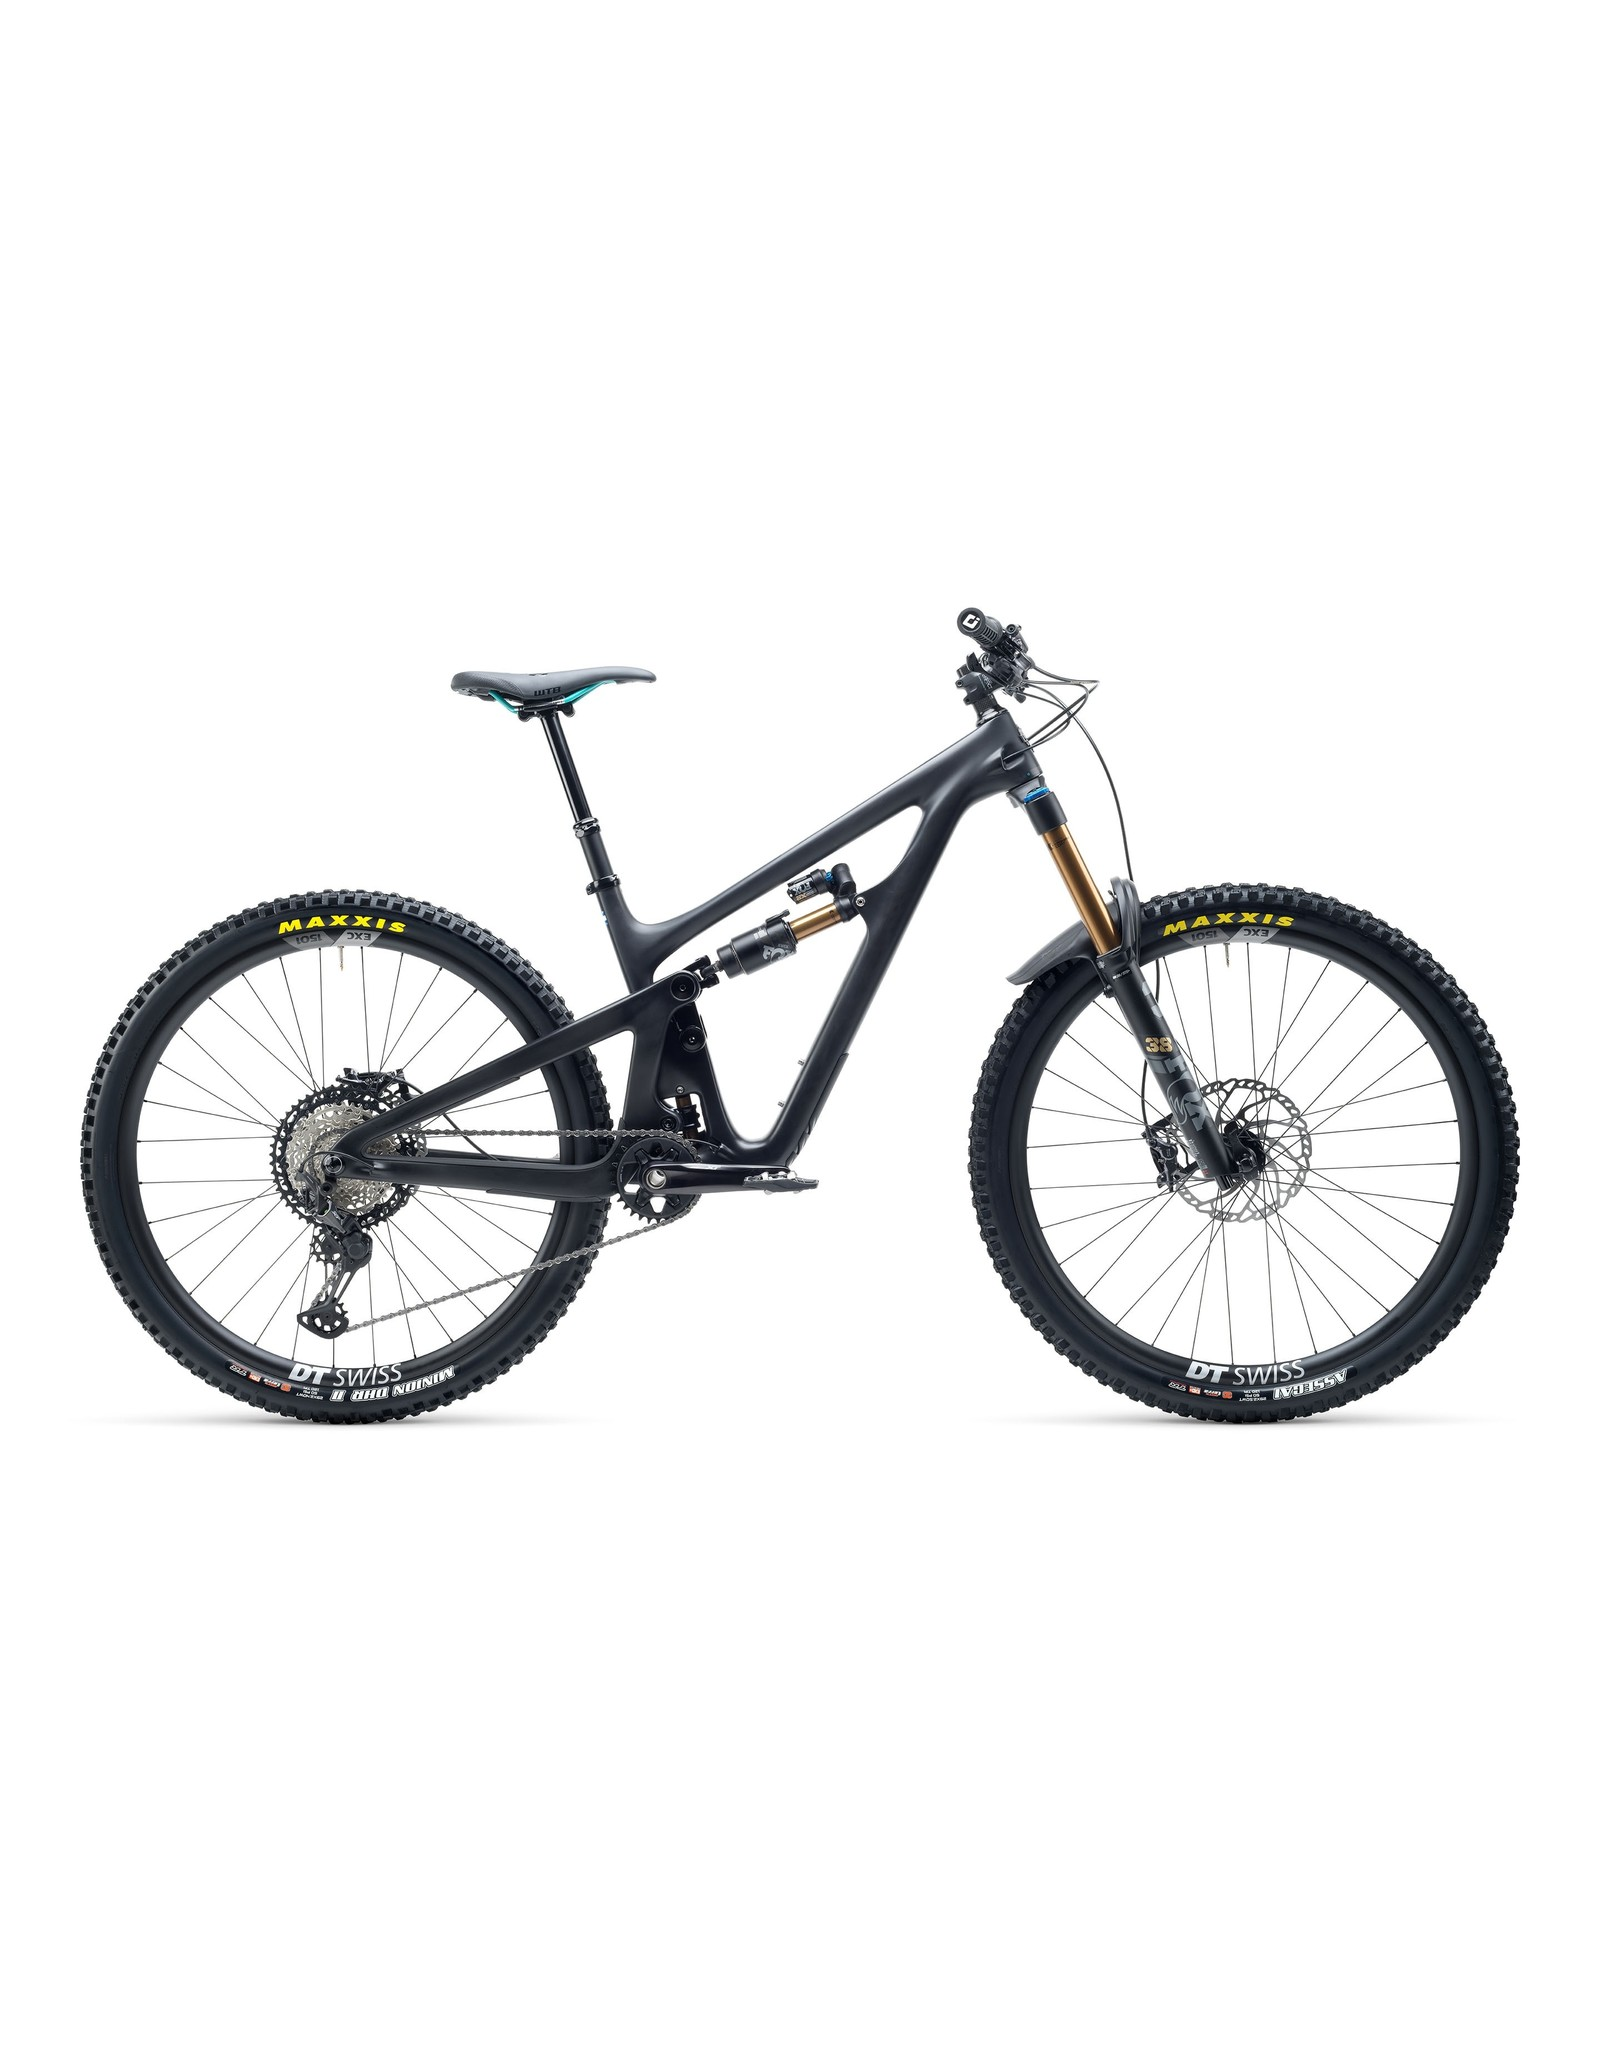 Yeti Yeti SB150 T-Series T1 /Carbon DT Wheels  2021